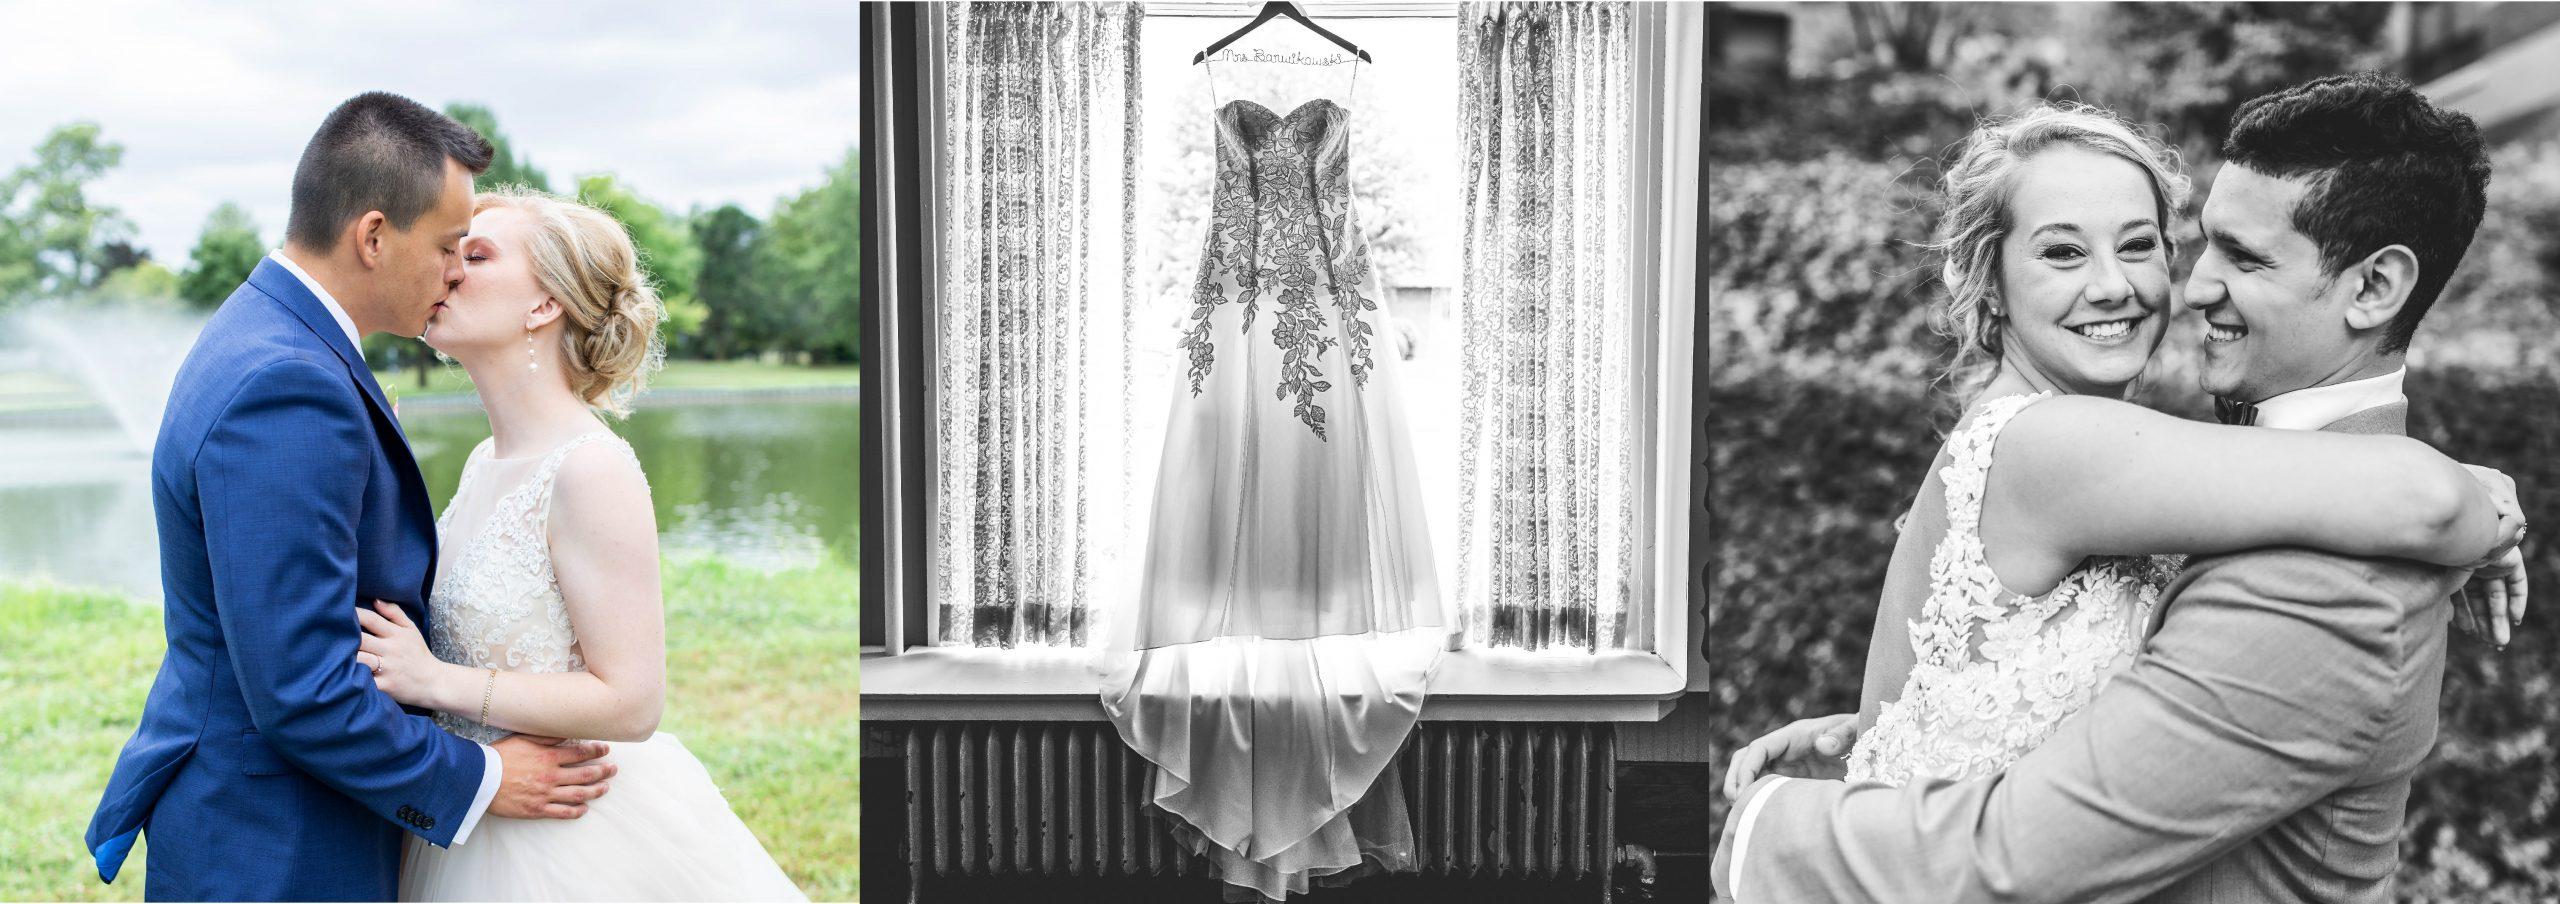 kandra-lynn-photography-michigan-wedding-photographer-18